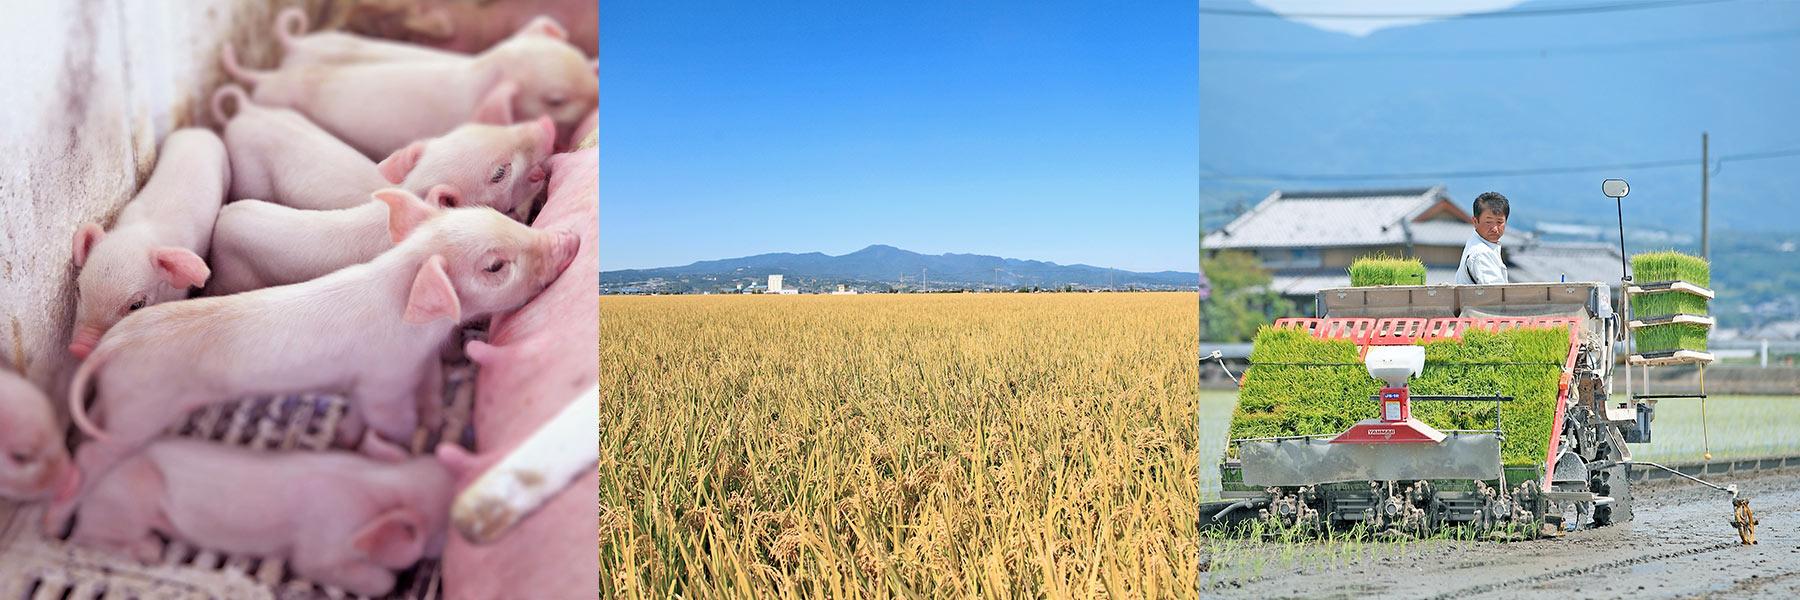 agriculture_bnr